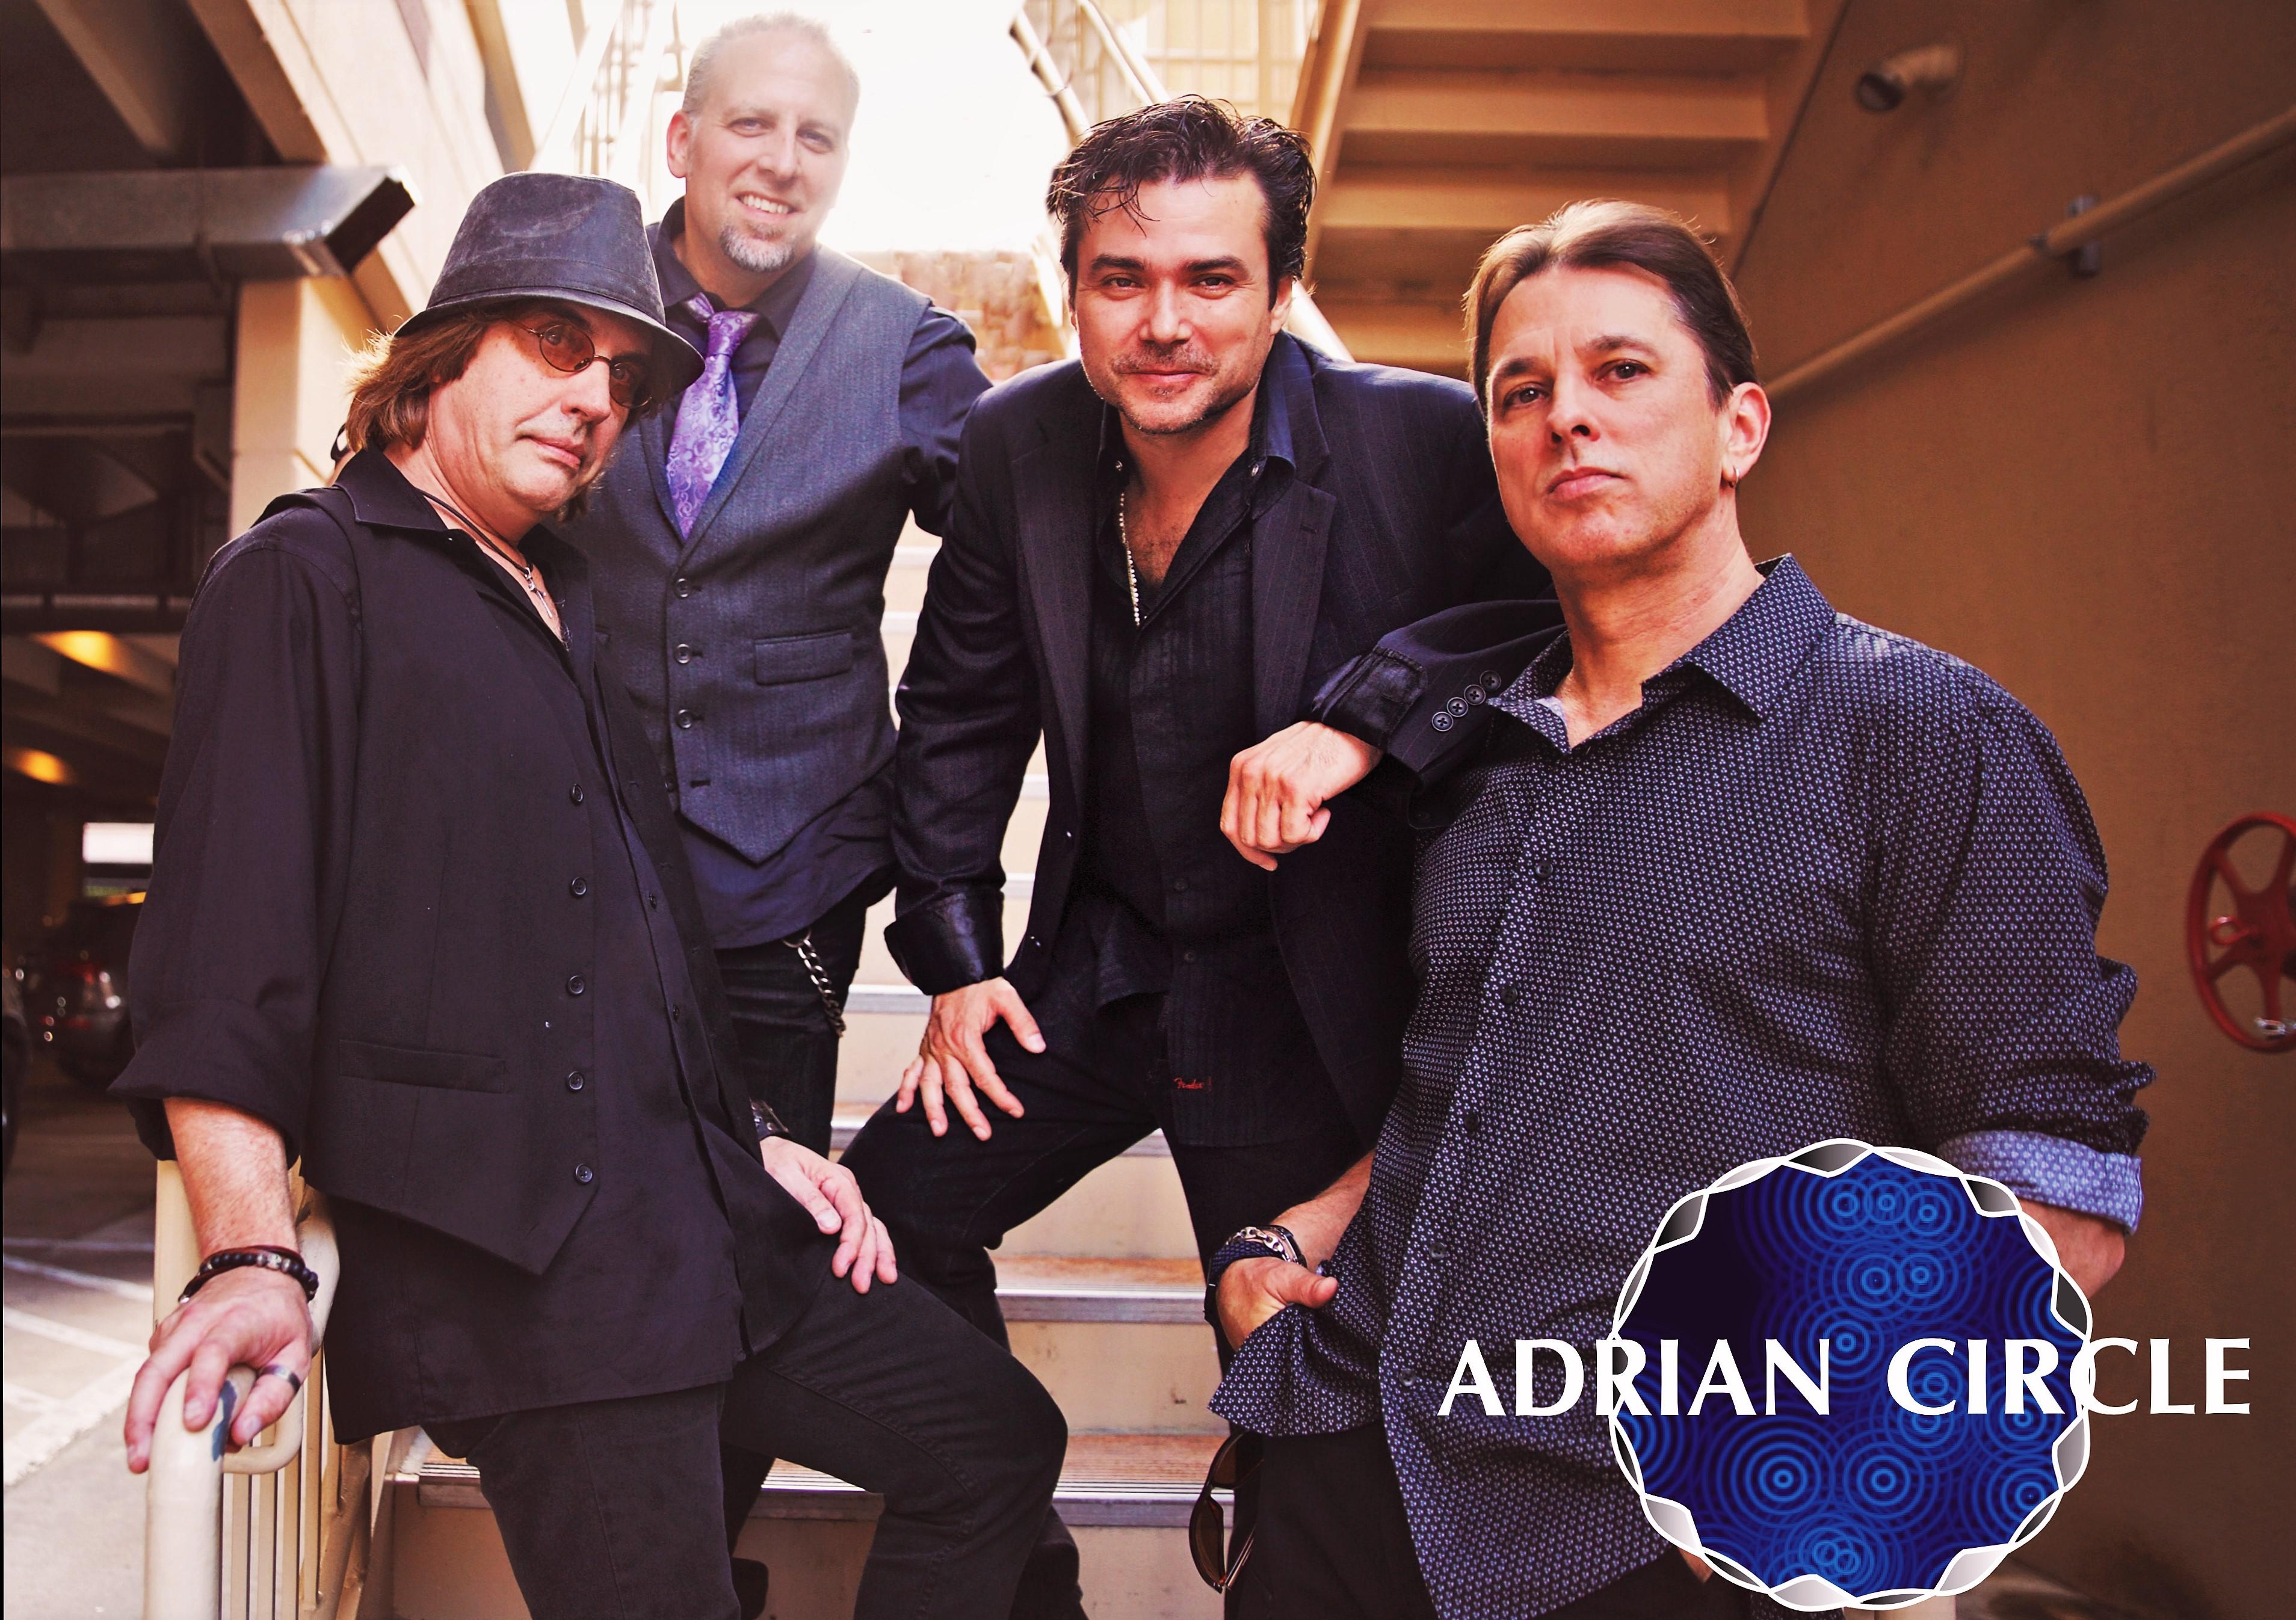 Adrian_Circle_Stairs_2-10x8_Logo